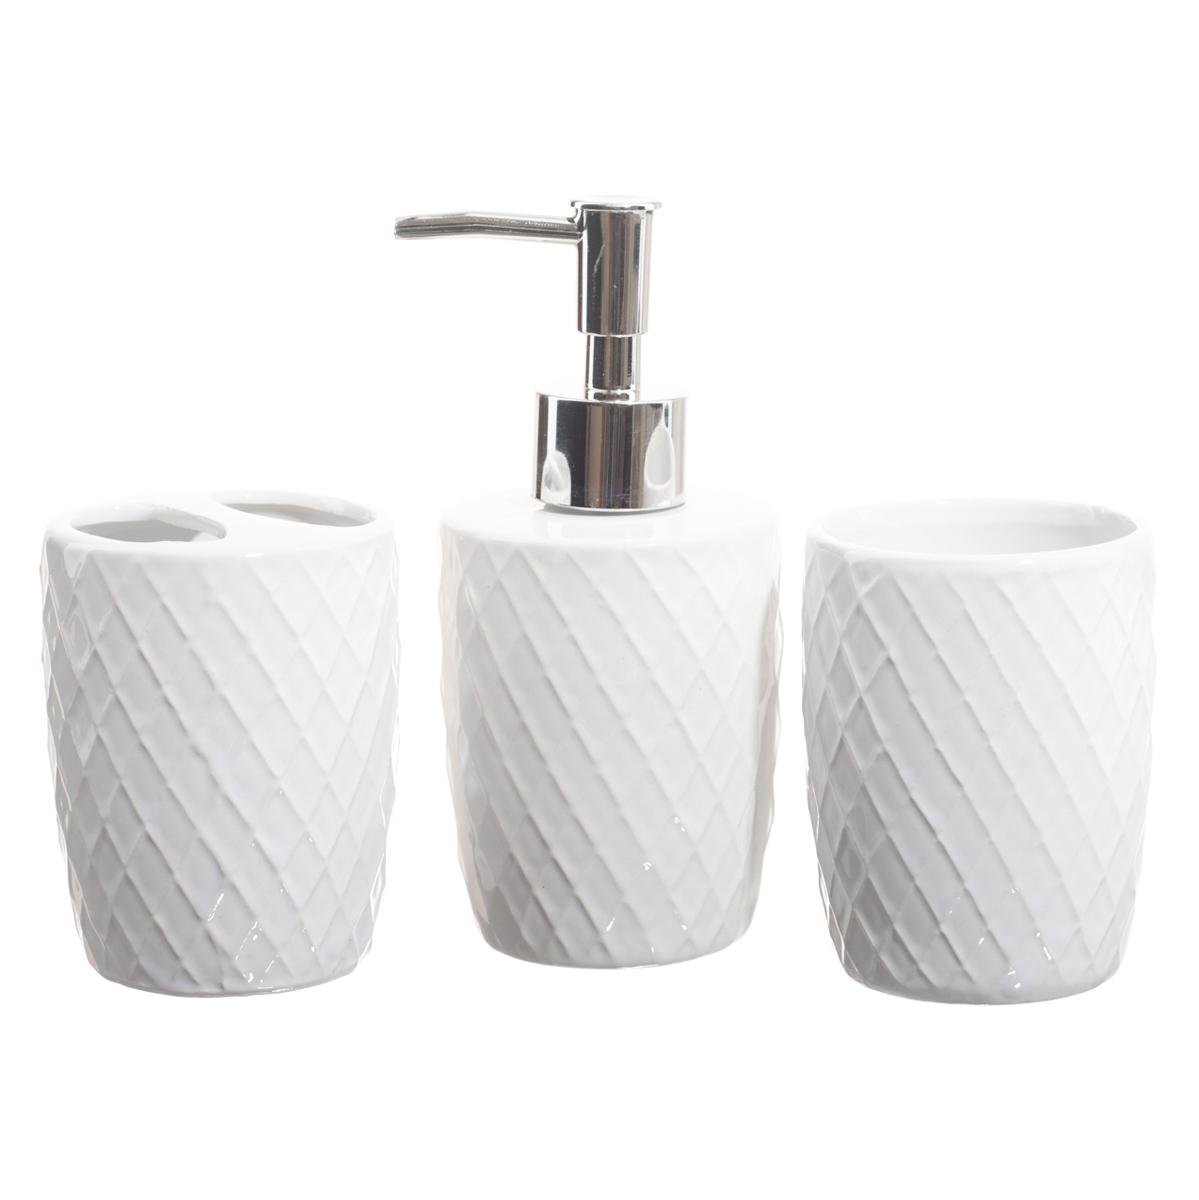 Kit Banheiro Lavabo Conjunto Acessórios 3 Peças = Branco